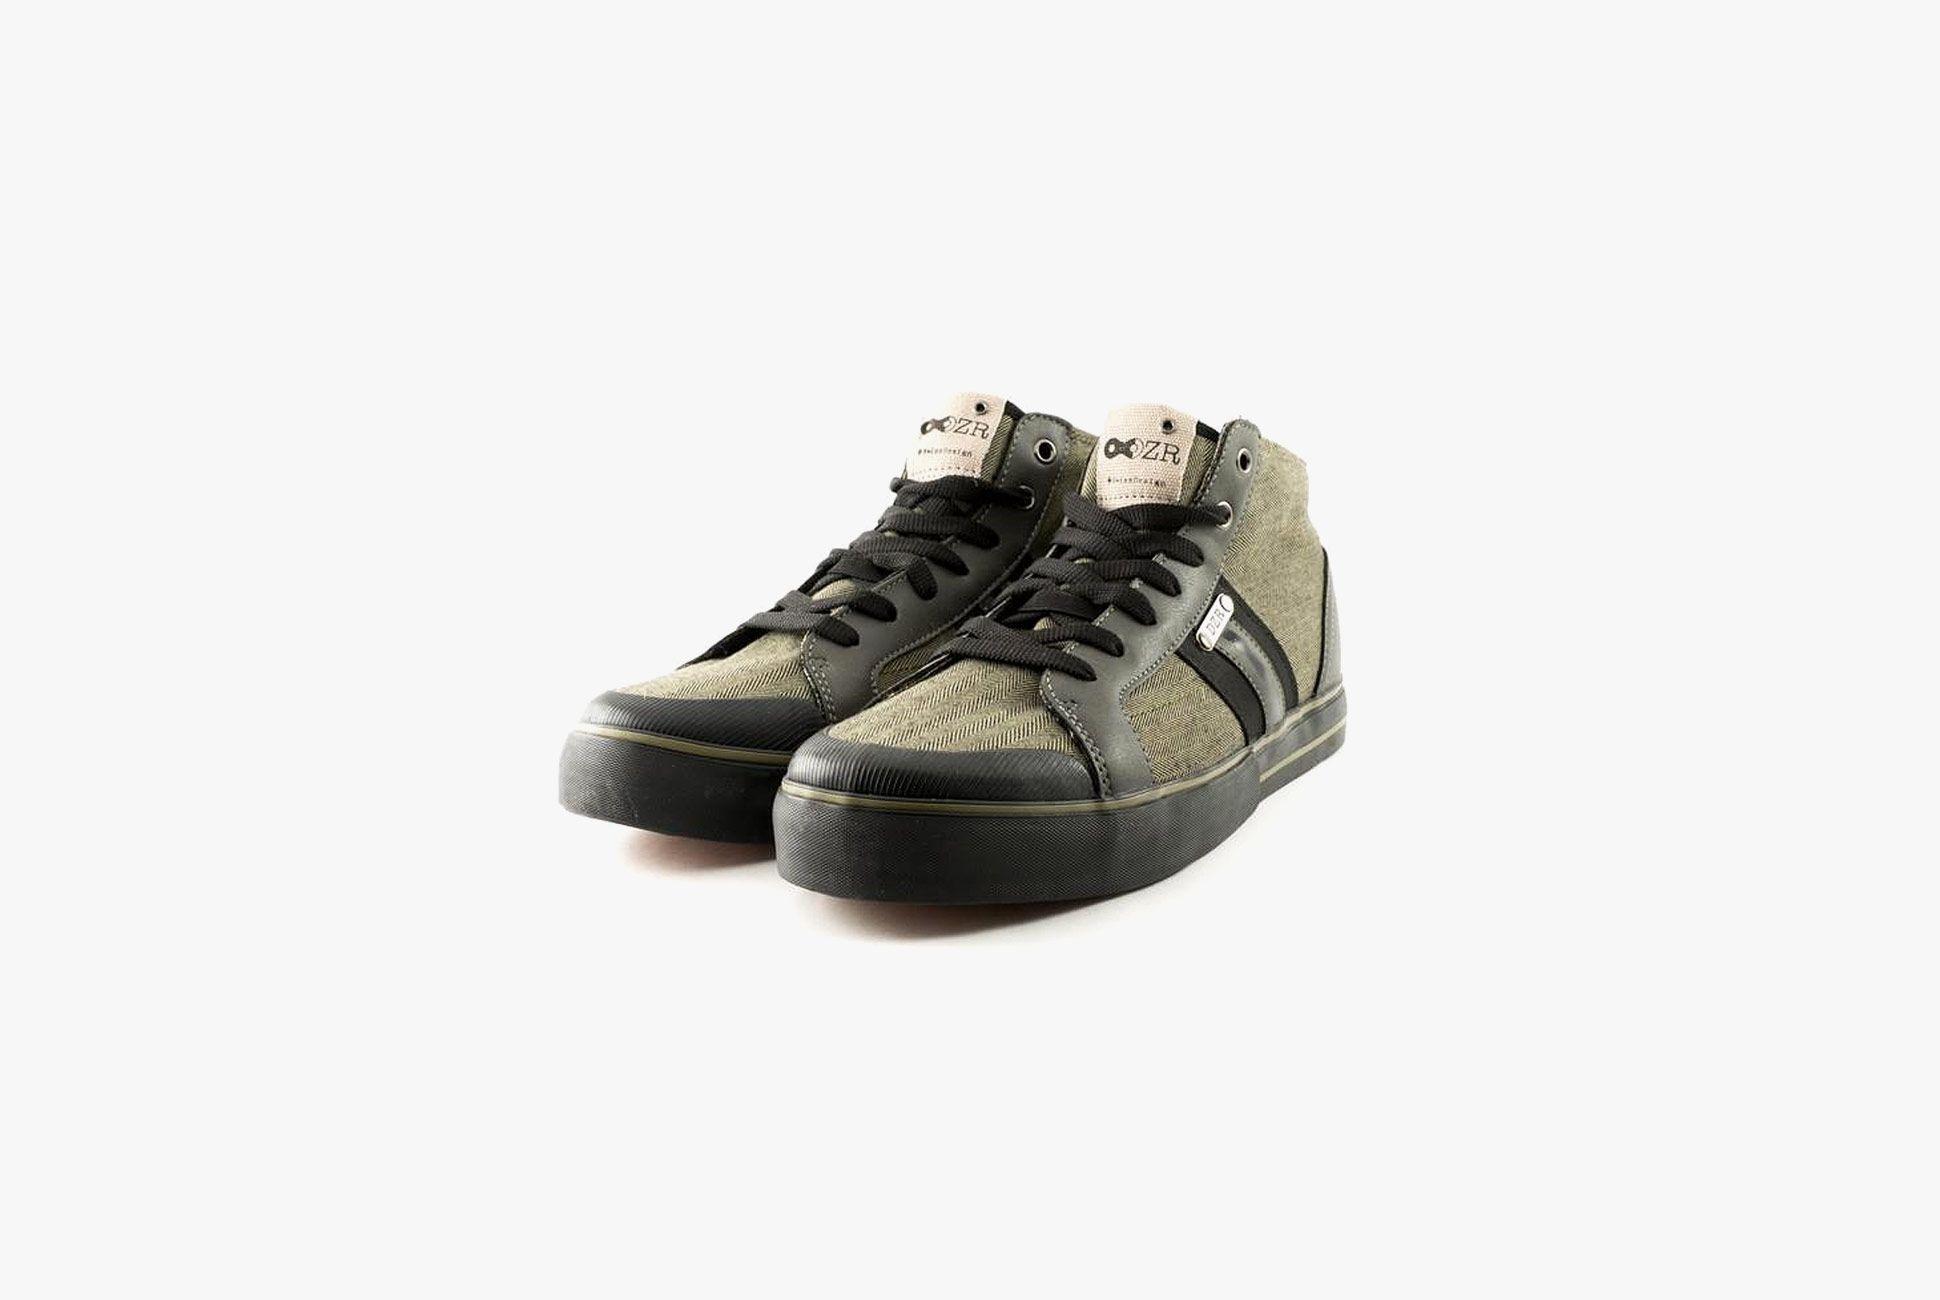 DZR-Shoes-gear-patrol-4